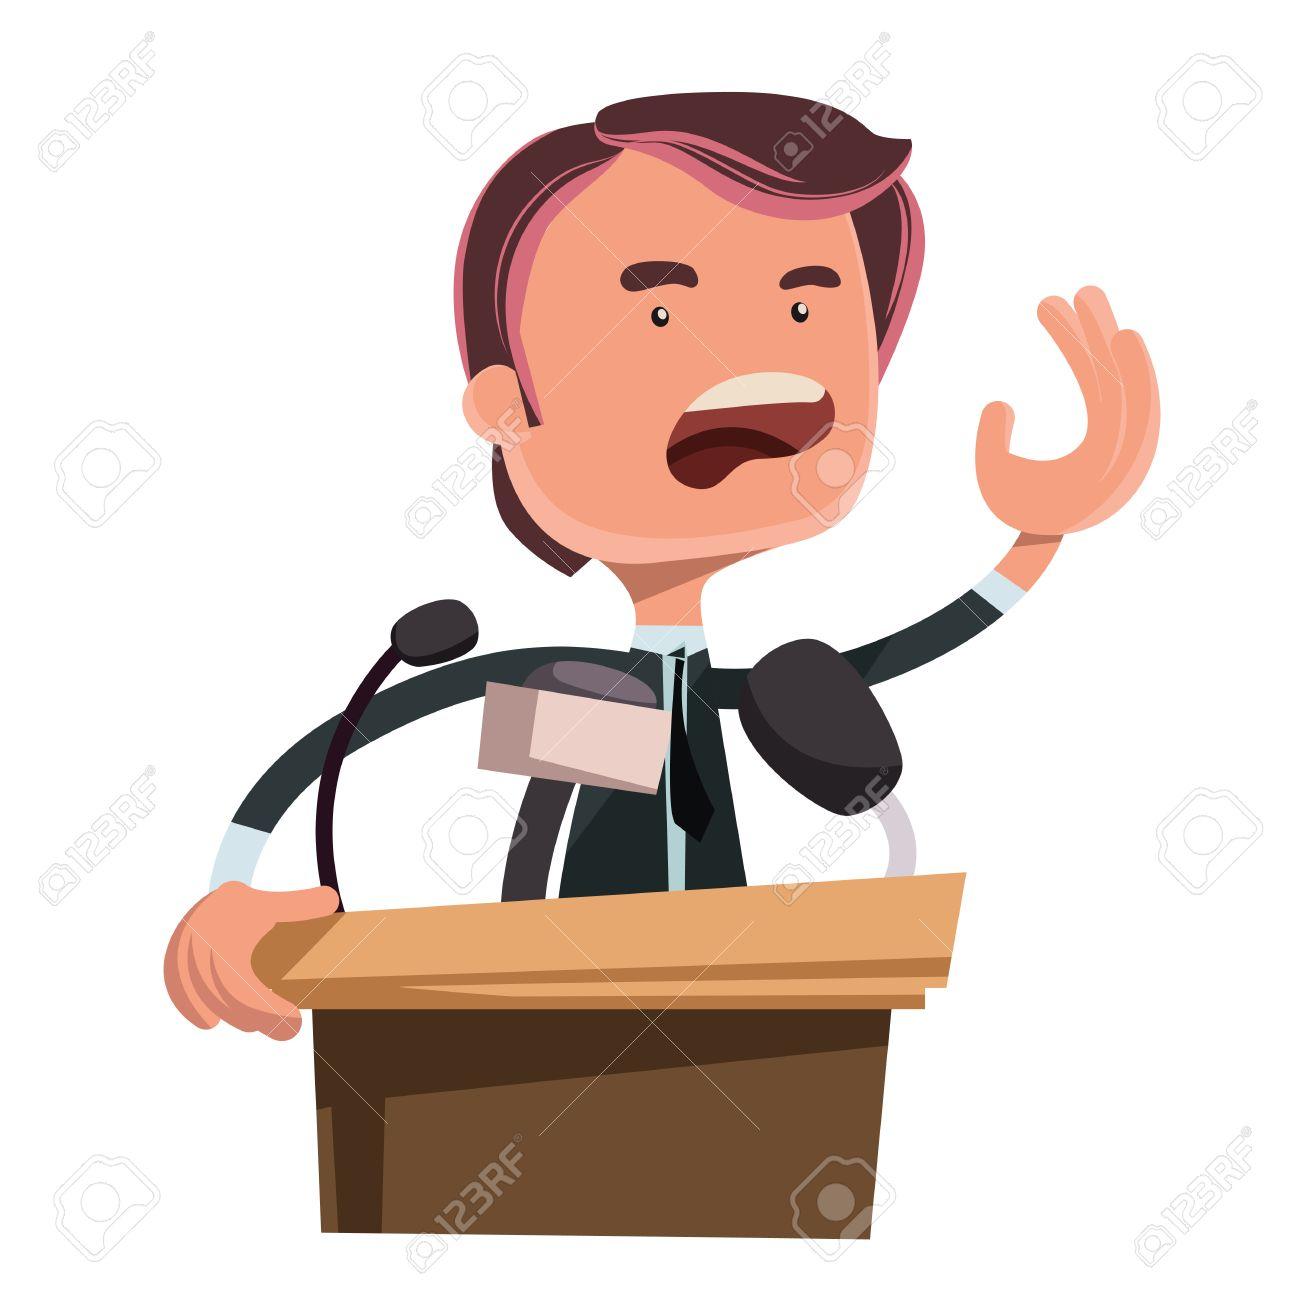 Speech on giving